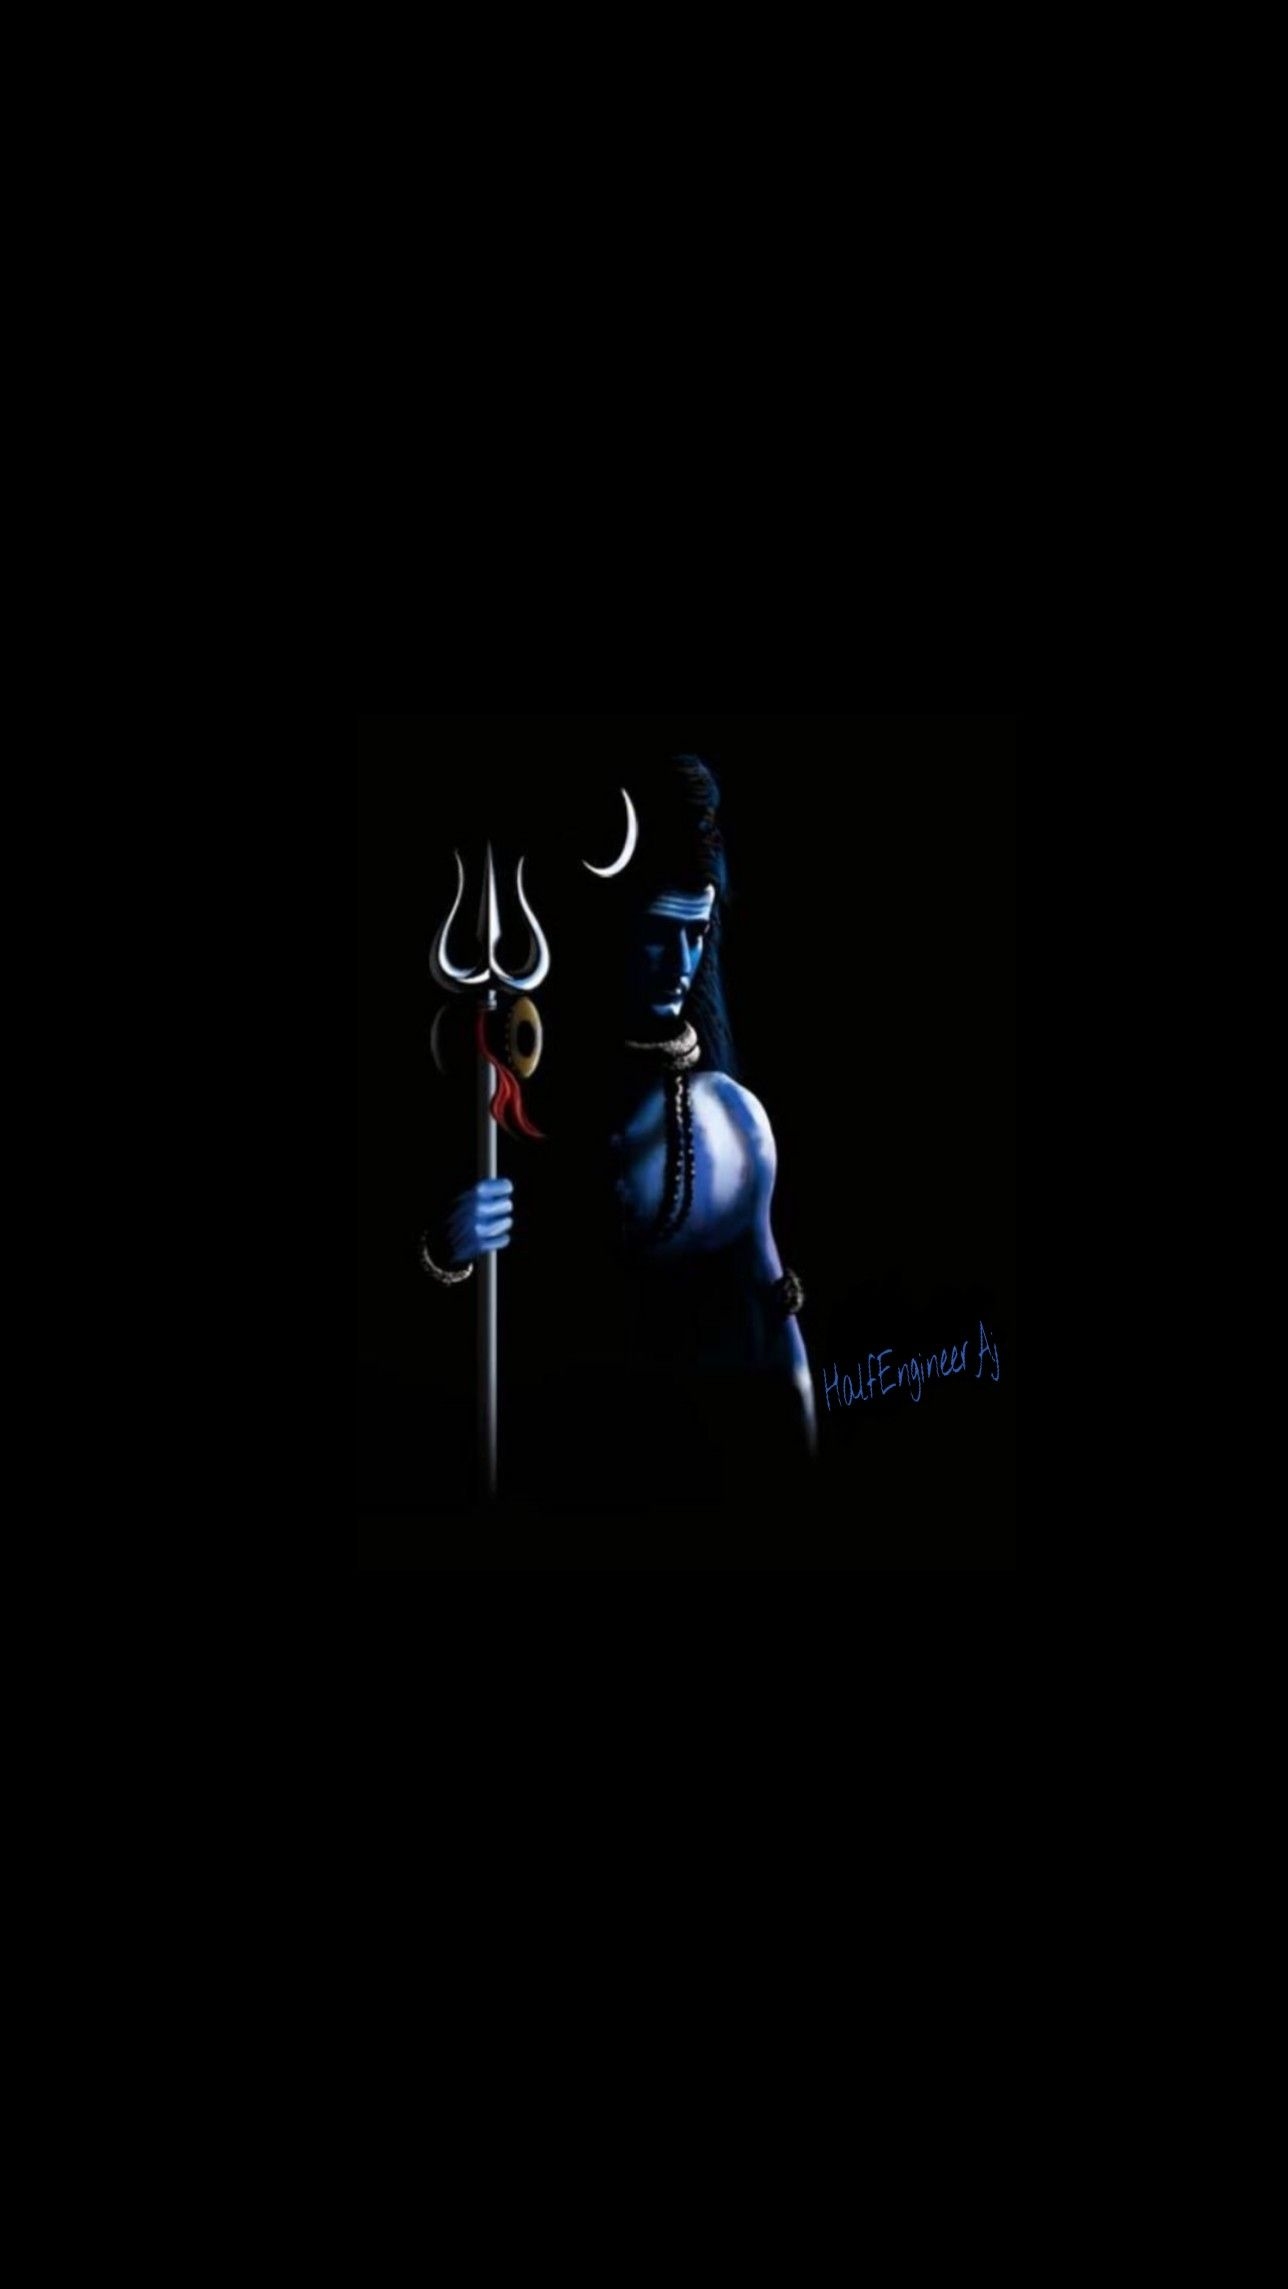 Discover The Coolest Mahakal Bhakt Mahakal Mahadev Images Lord Shiva Hd Wallpaper Shiva Lord Wallpapers Lord Shiva Hd Images